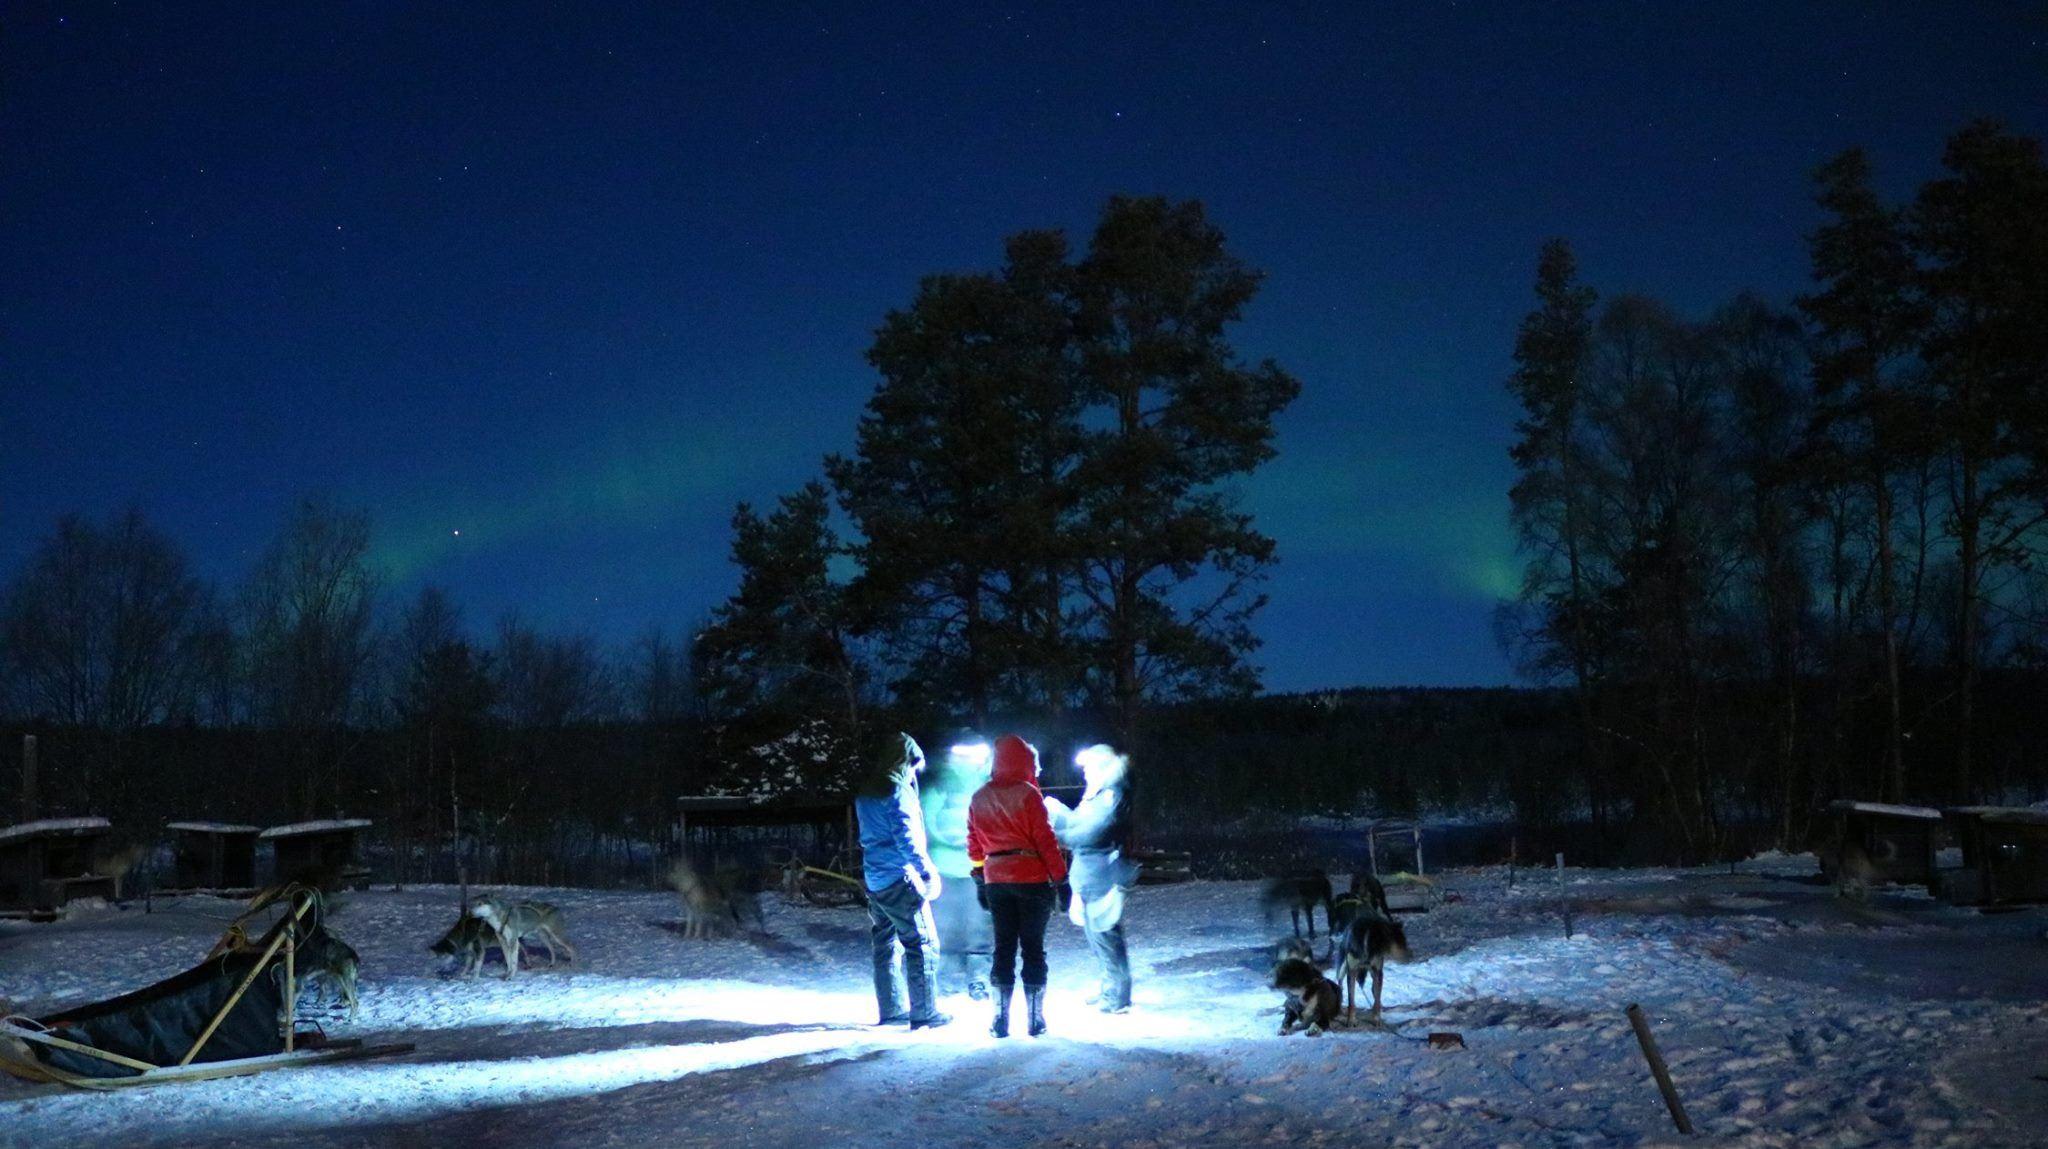 Northern light husky safari (Accommodation at BIRK is needed)